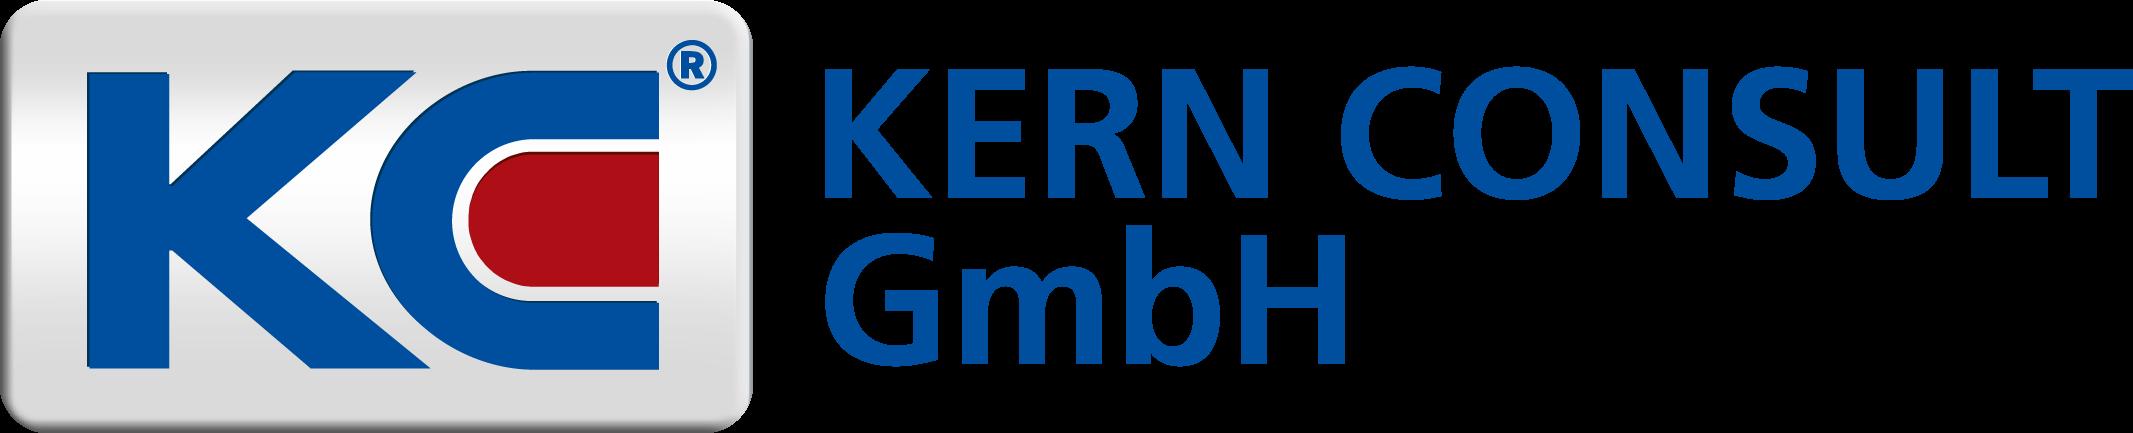 Kern Consult GmbH